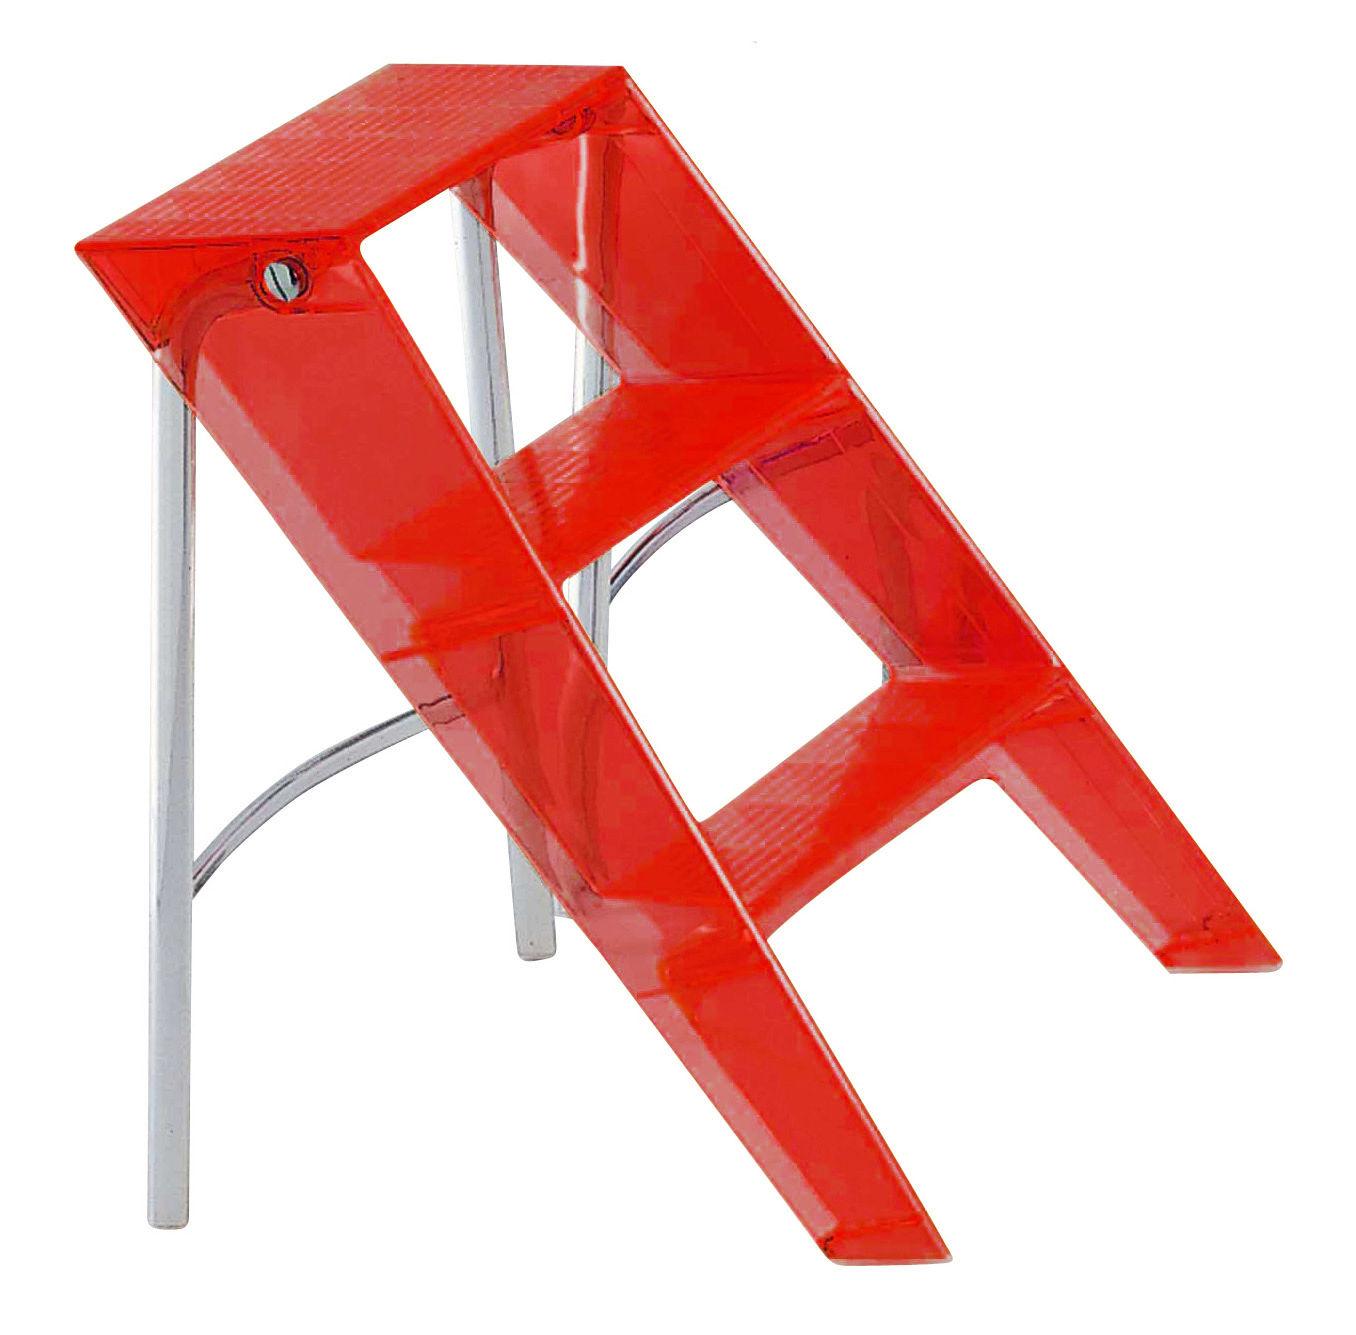 Furniture - Miscellaneous furniture - Upper Stepladder by Kartell - red orange - Polycarbonate